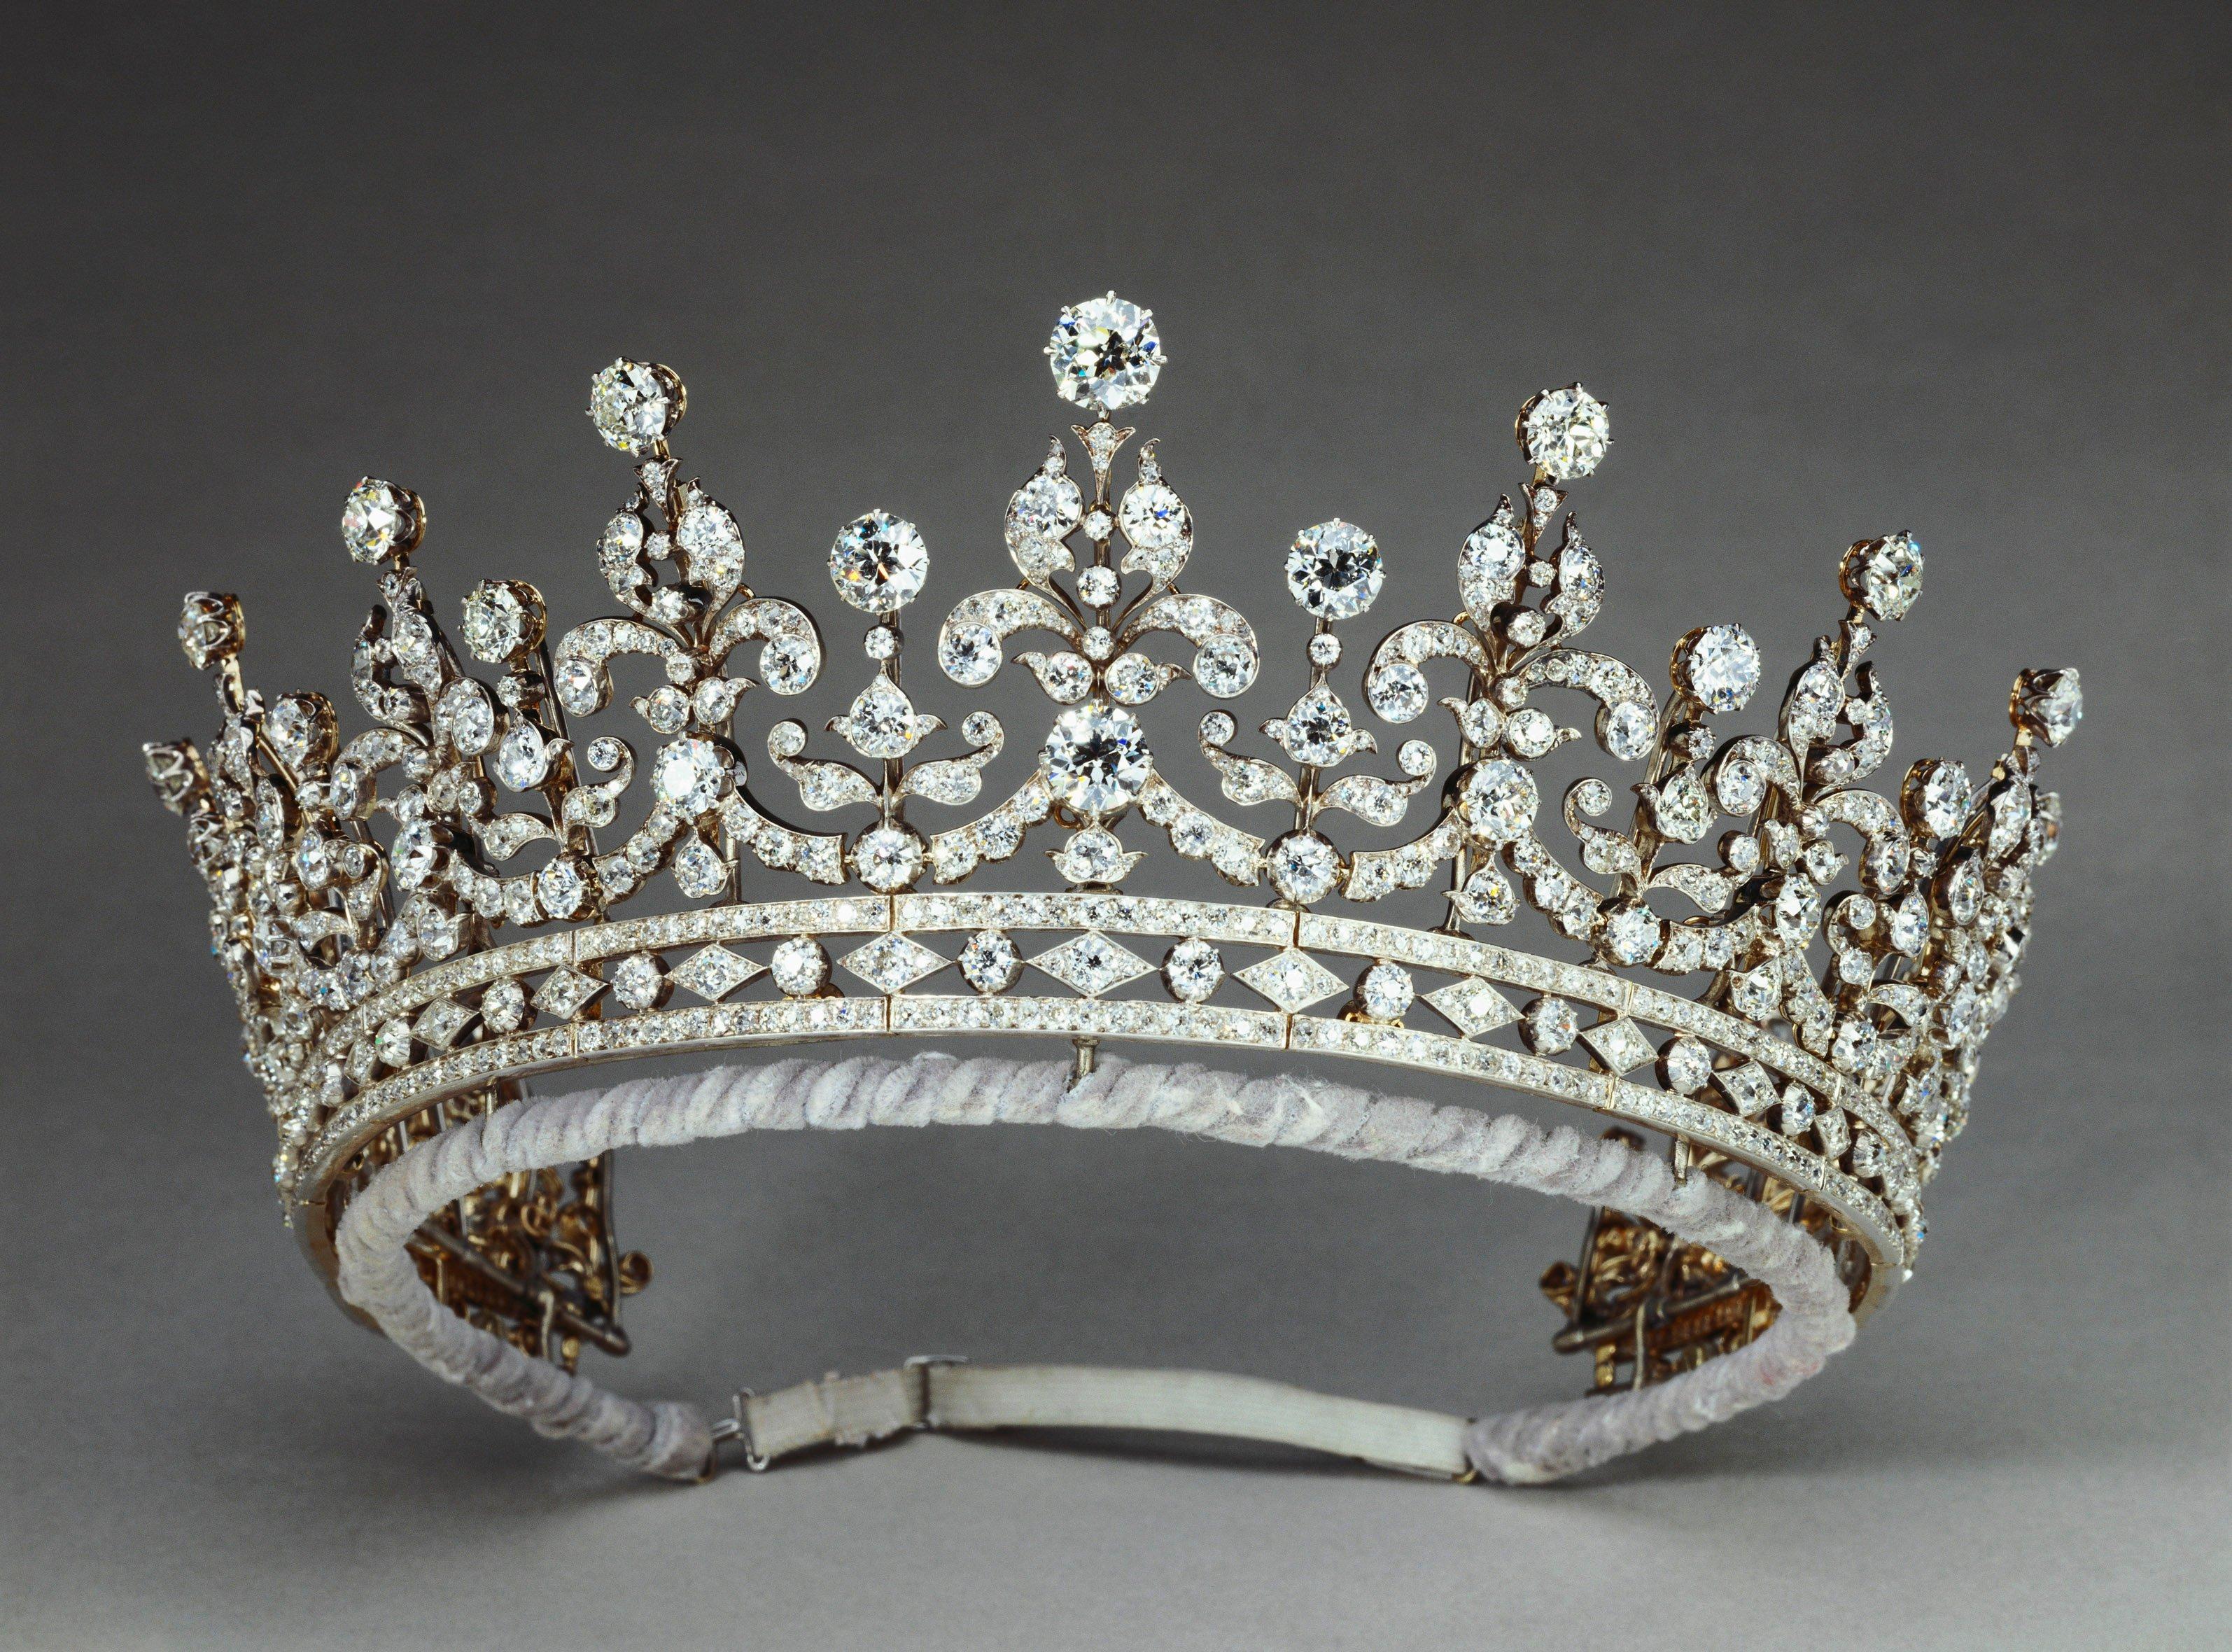 Luxury Micro Zircon Crown Princess Crowns And Tiaras Bride